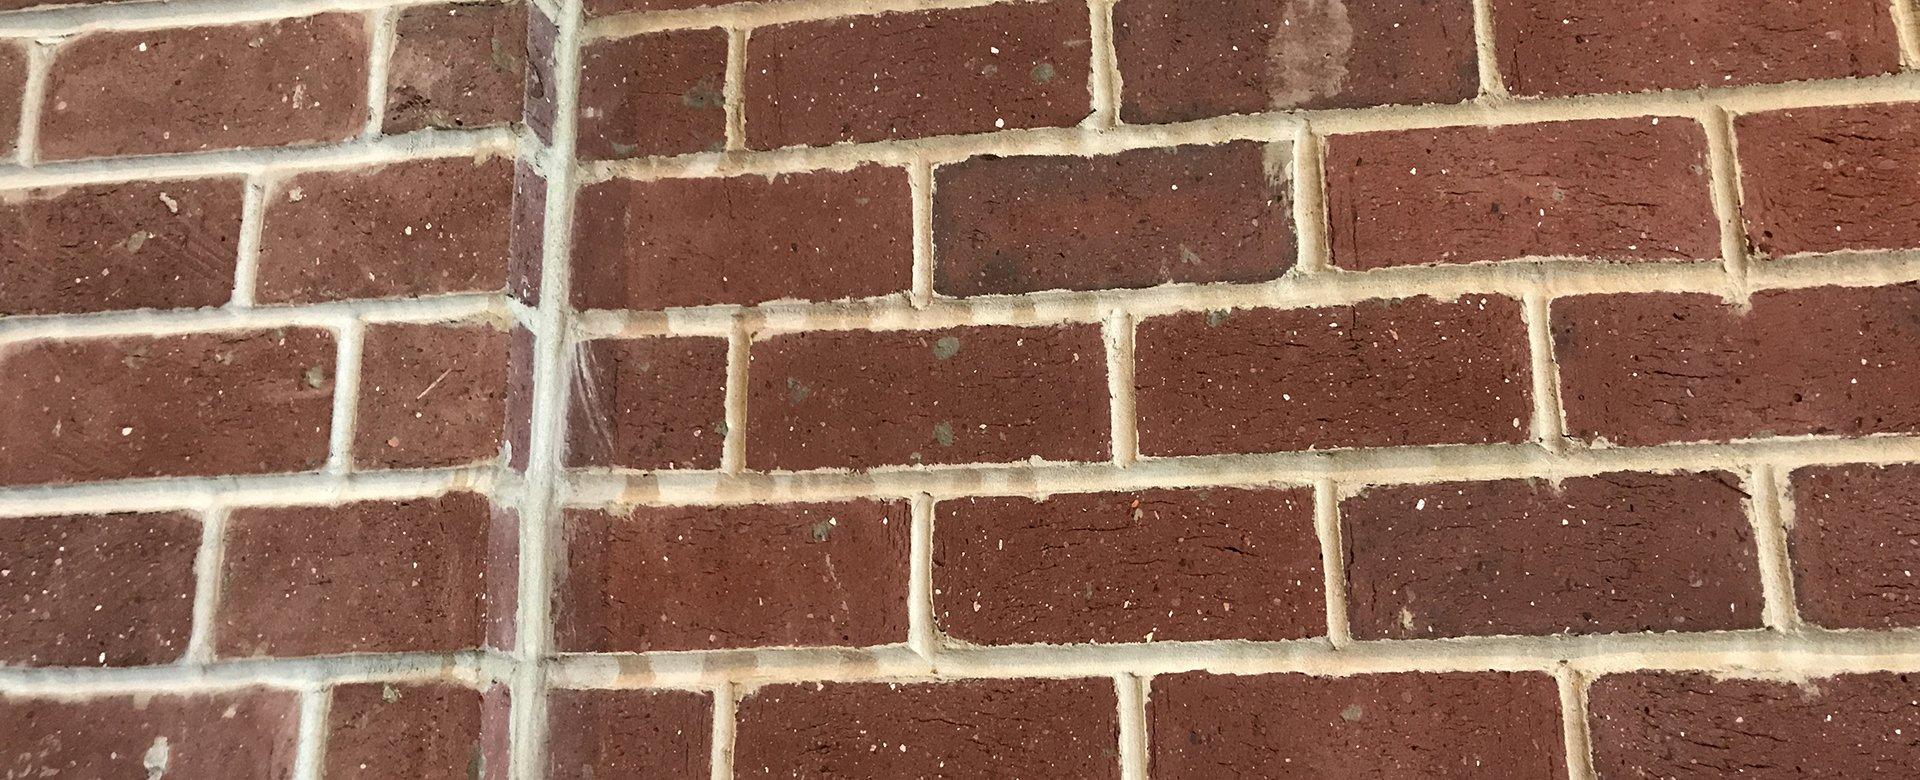 Thin brick